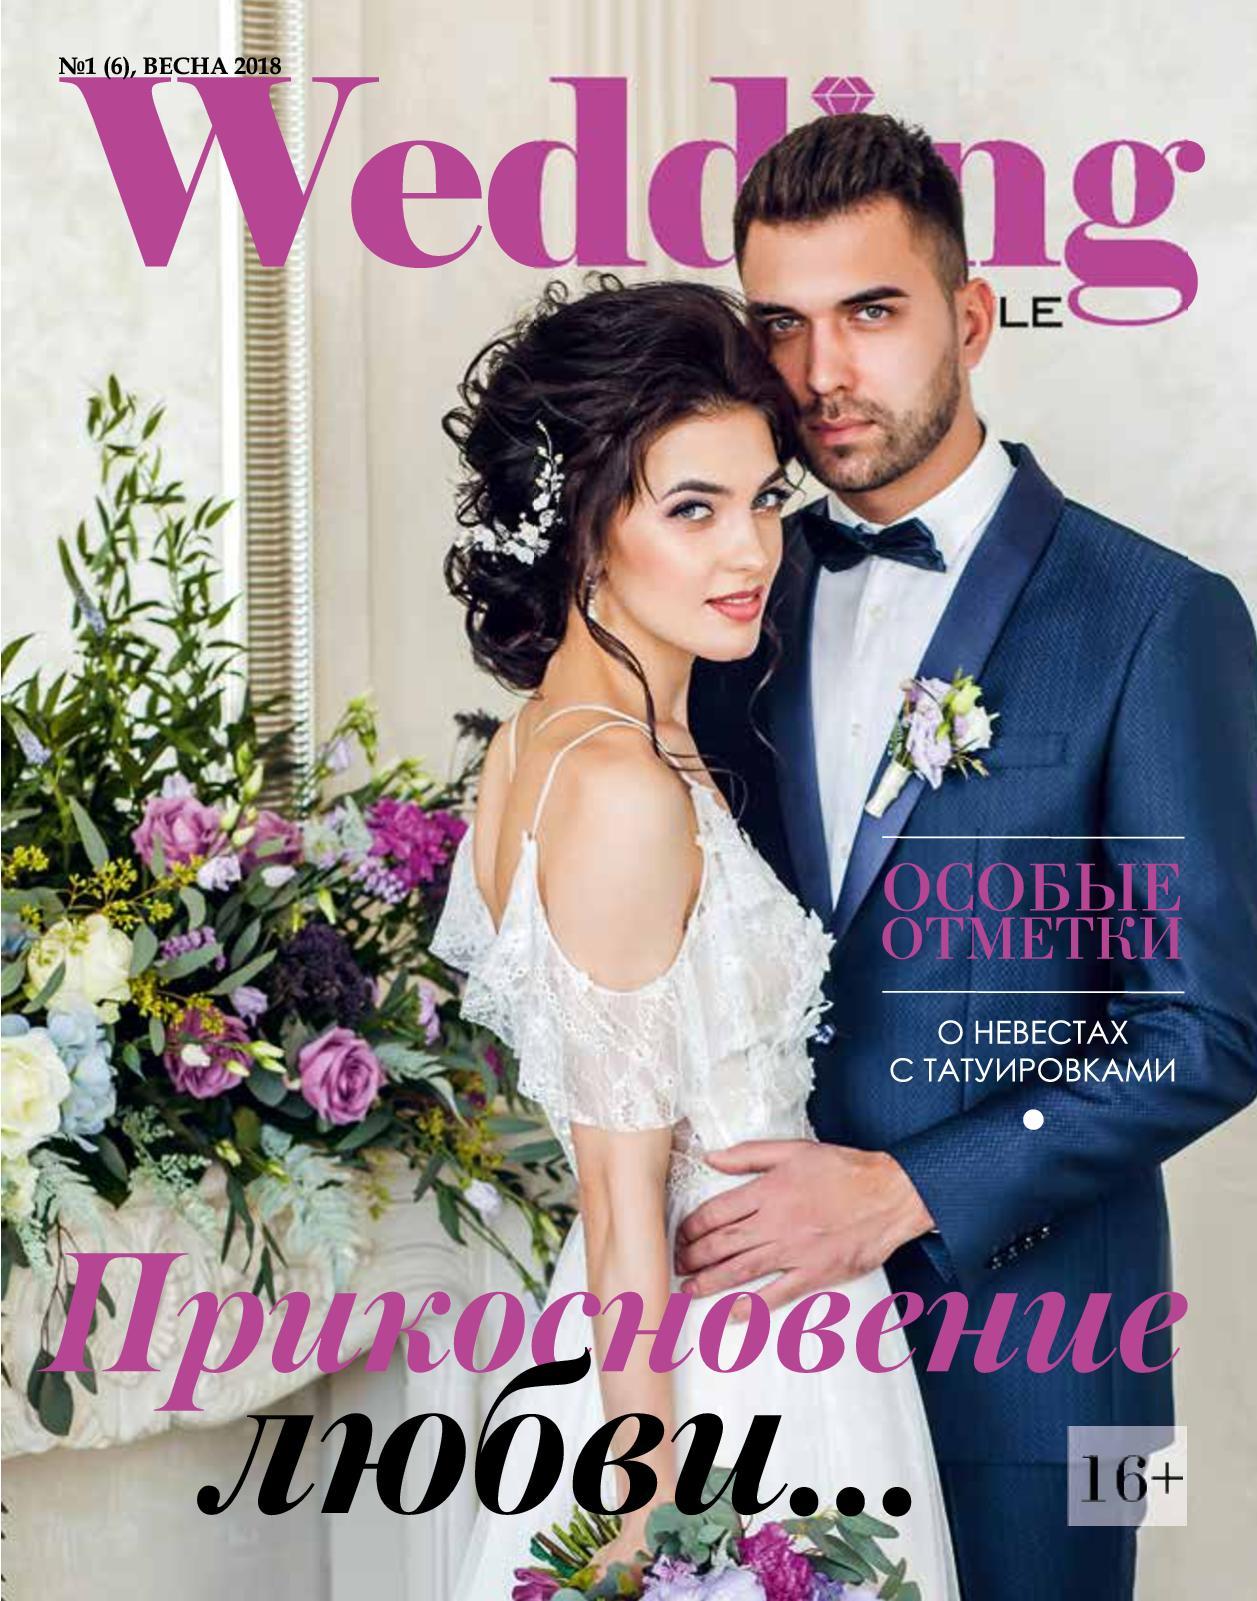 Свадебный журнал Wedding Style, №1(6) Весна 2018г.